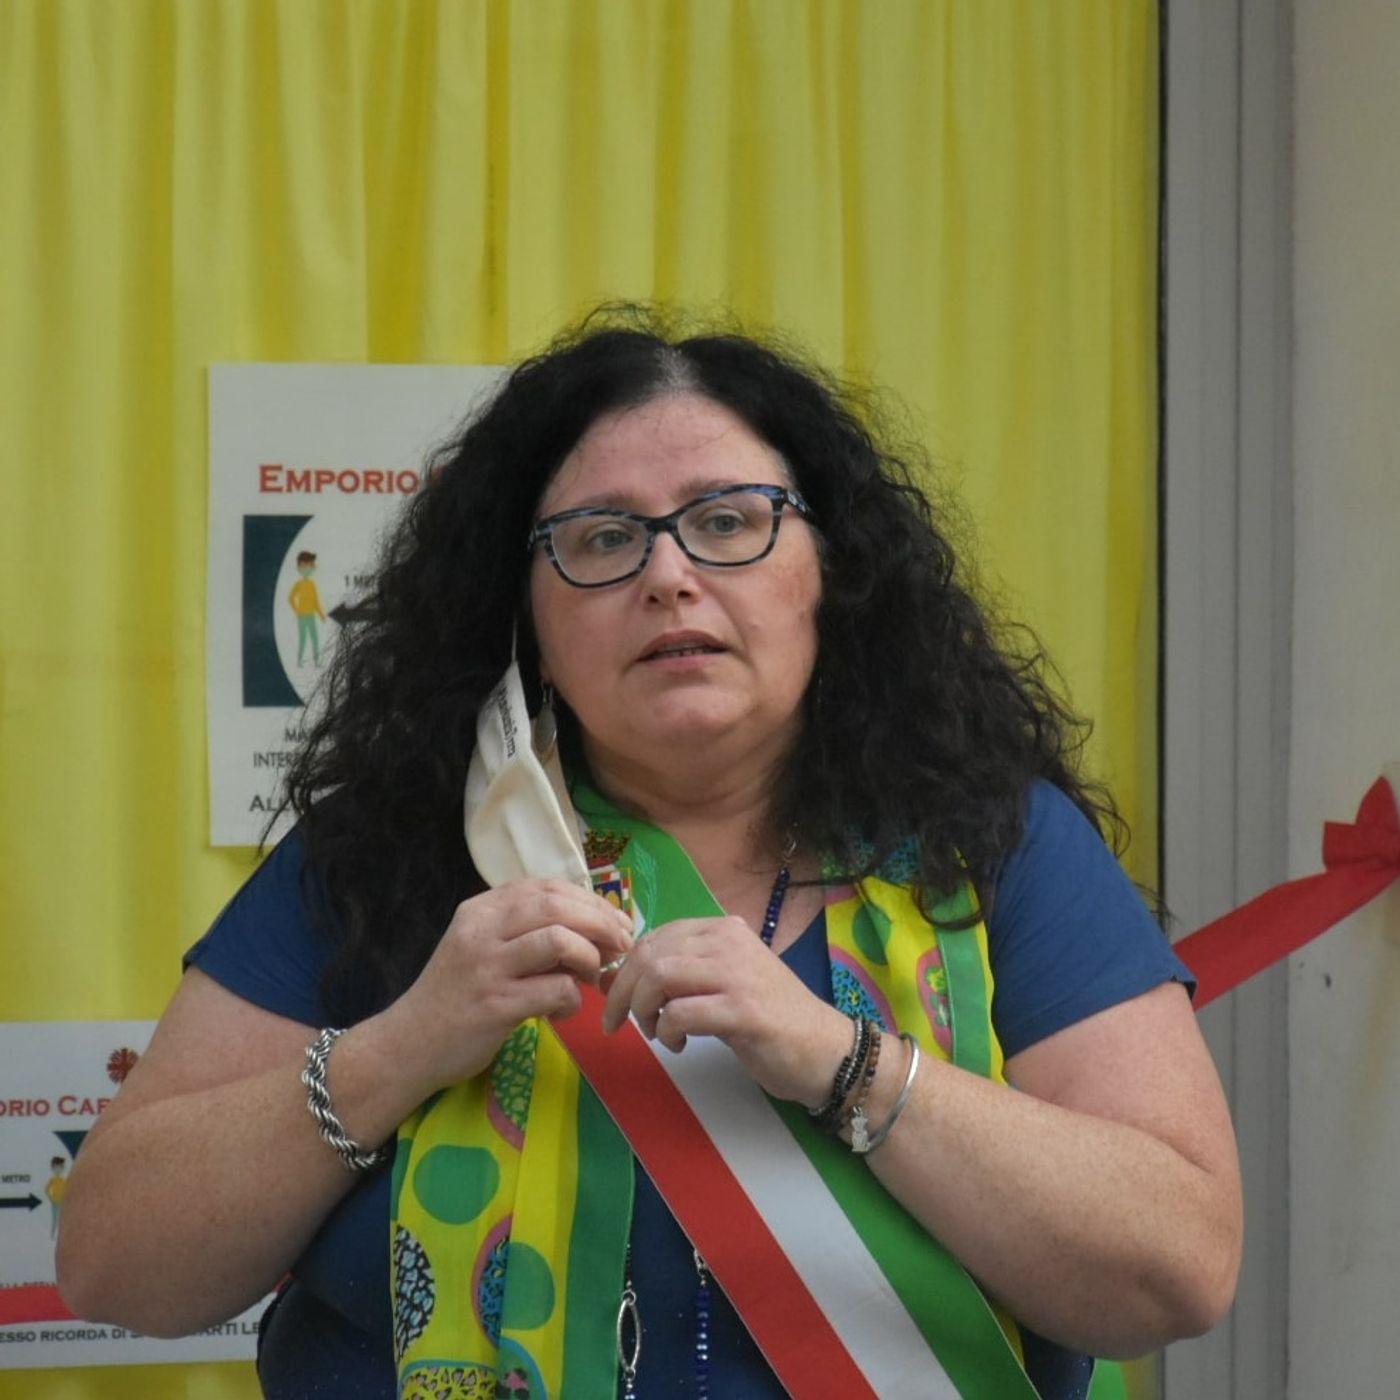 Emporio Caritas a Formia - Le parole di Paola Villa